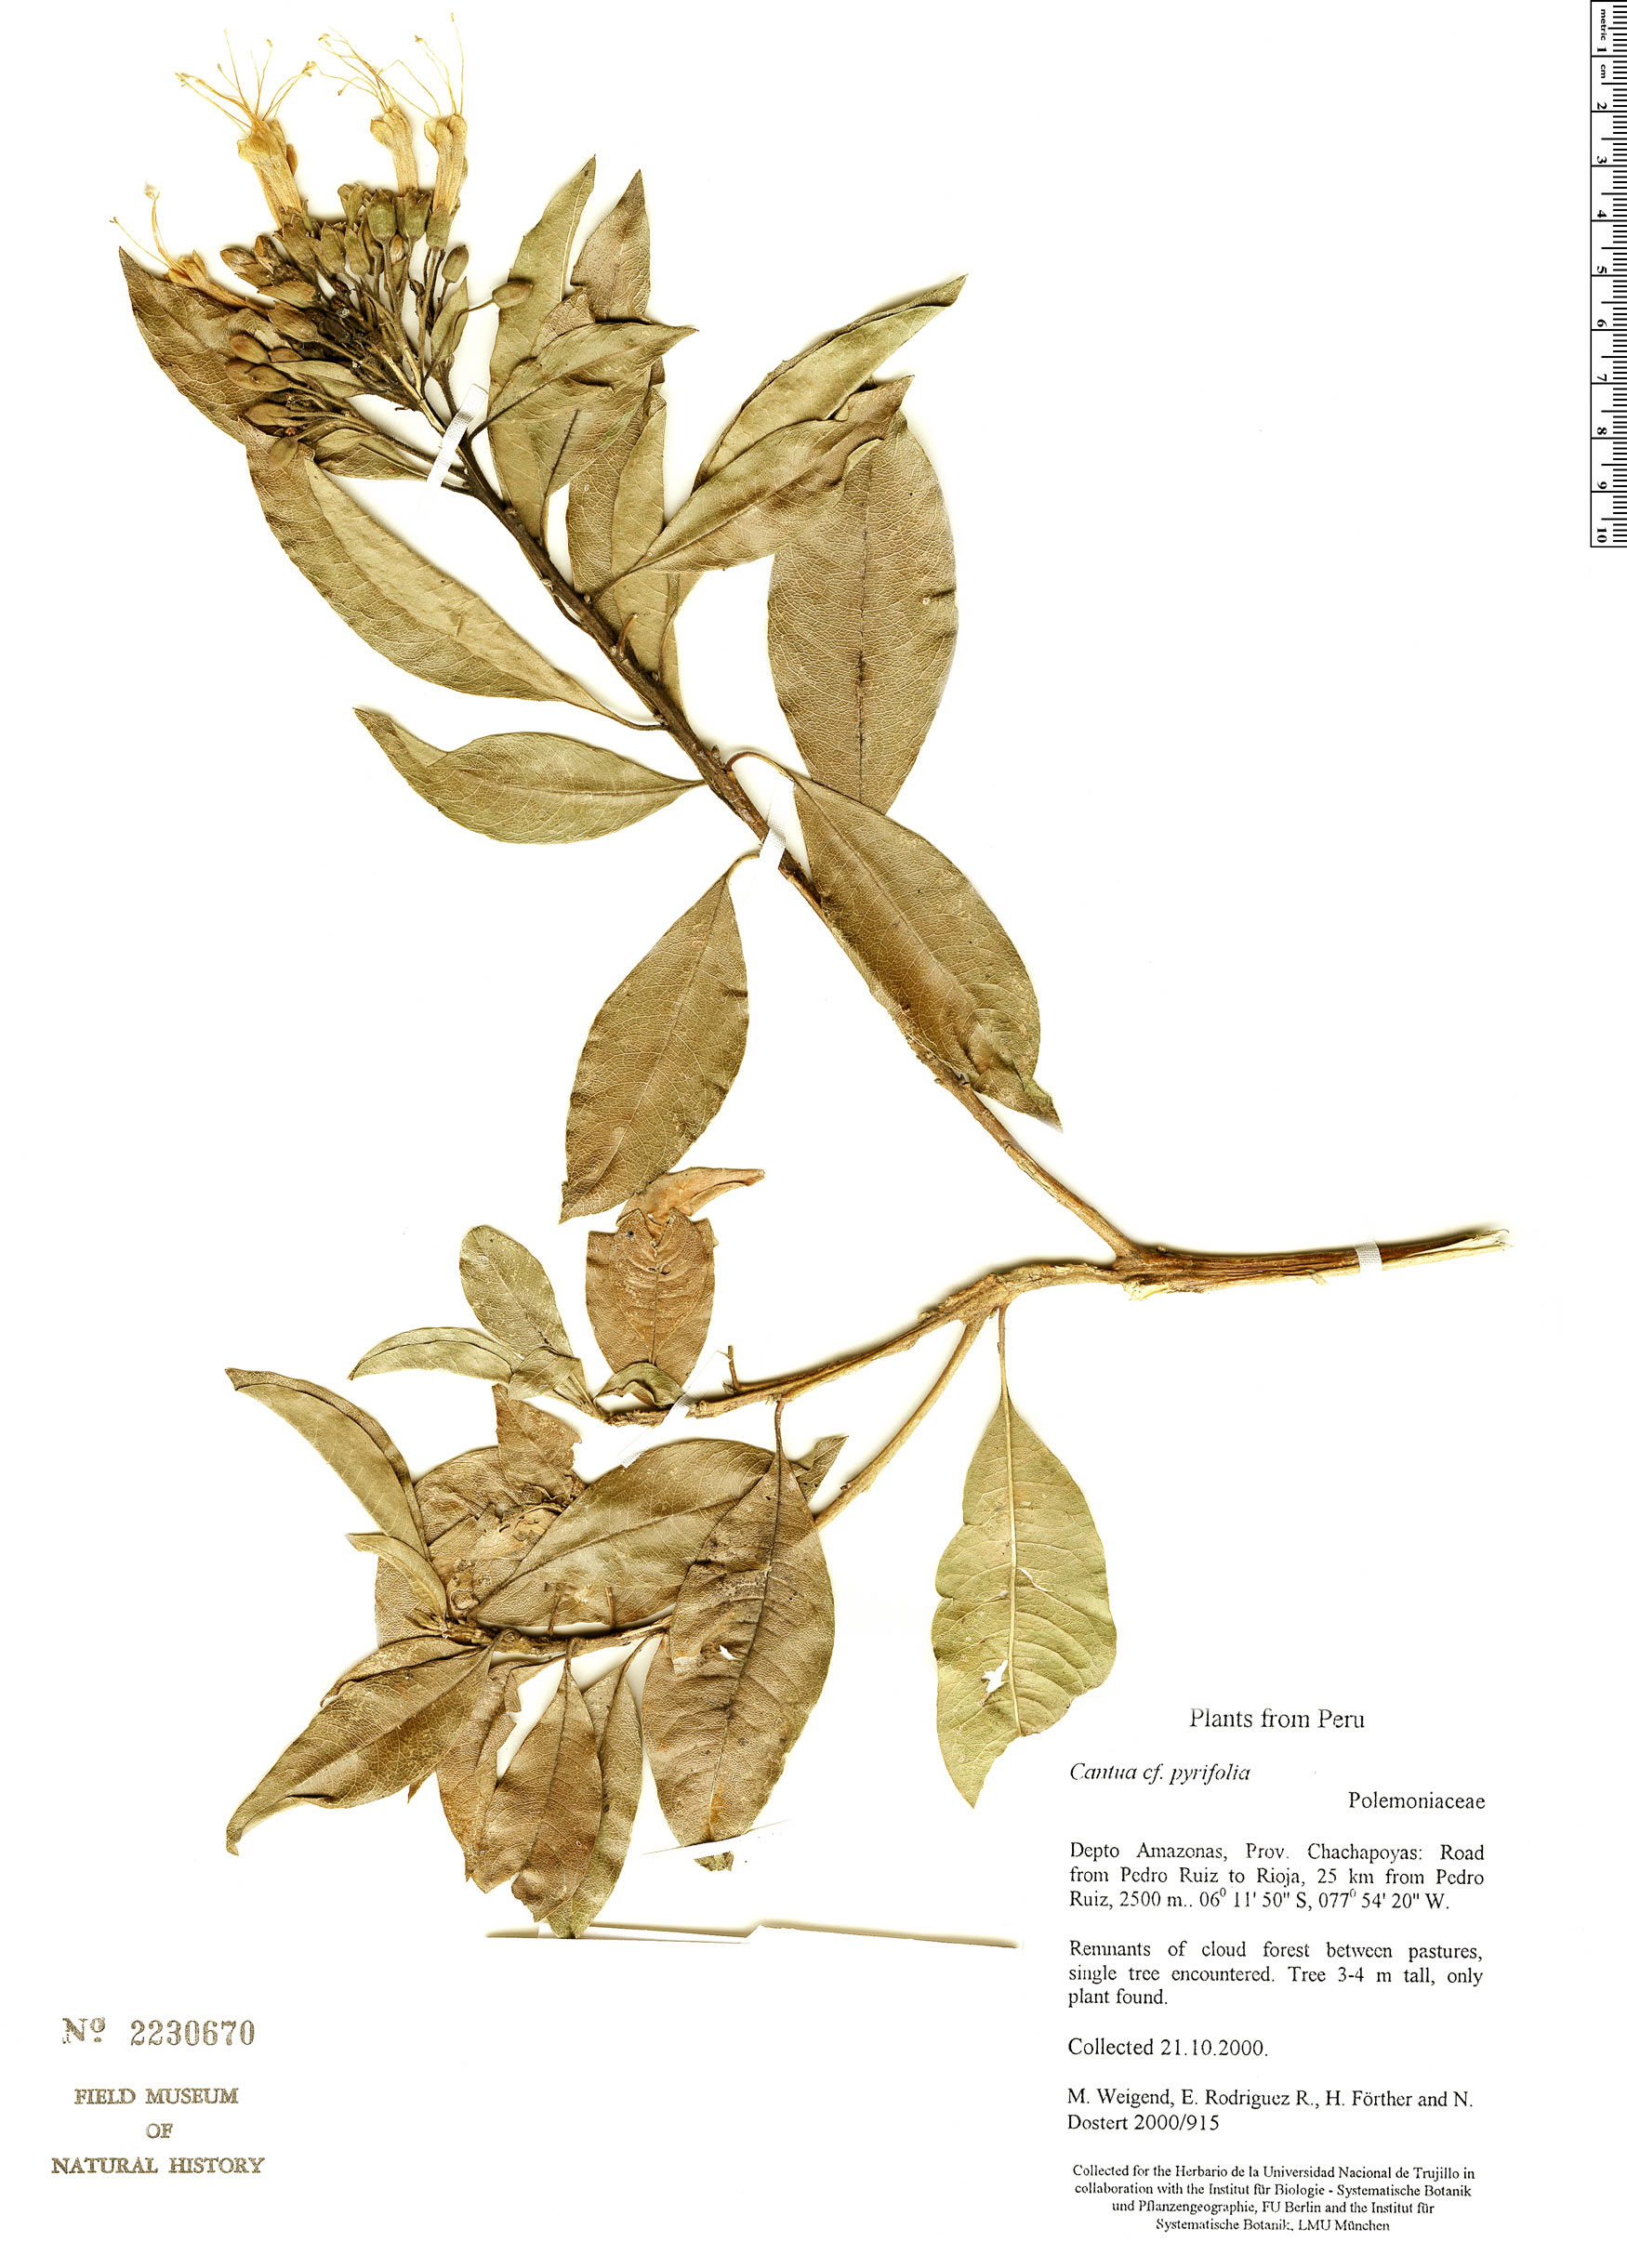 Specimen: Cantua pyrifolia